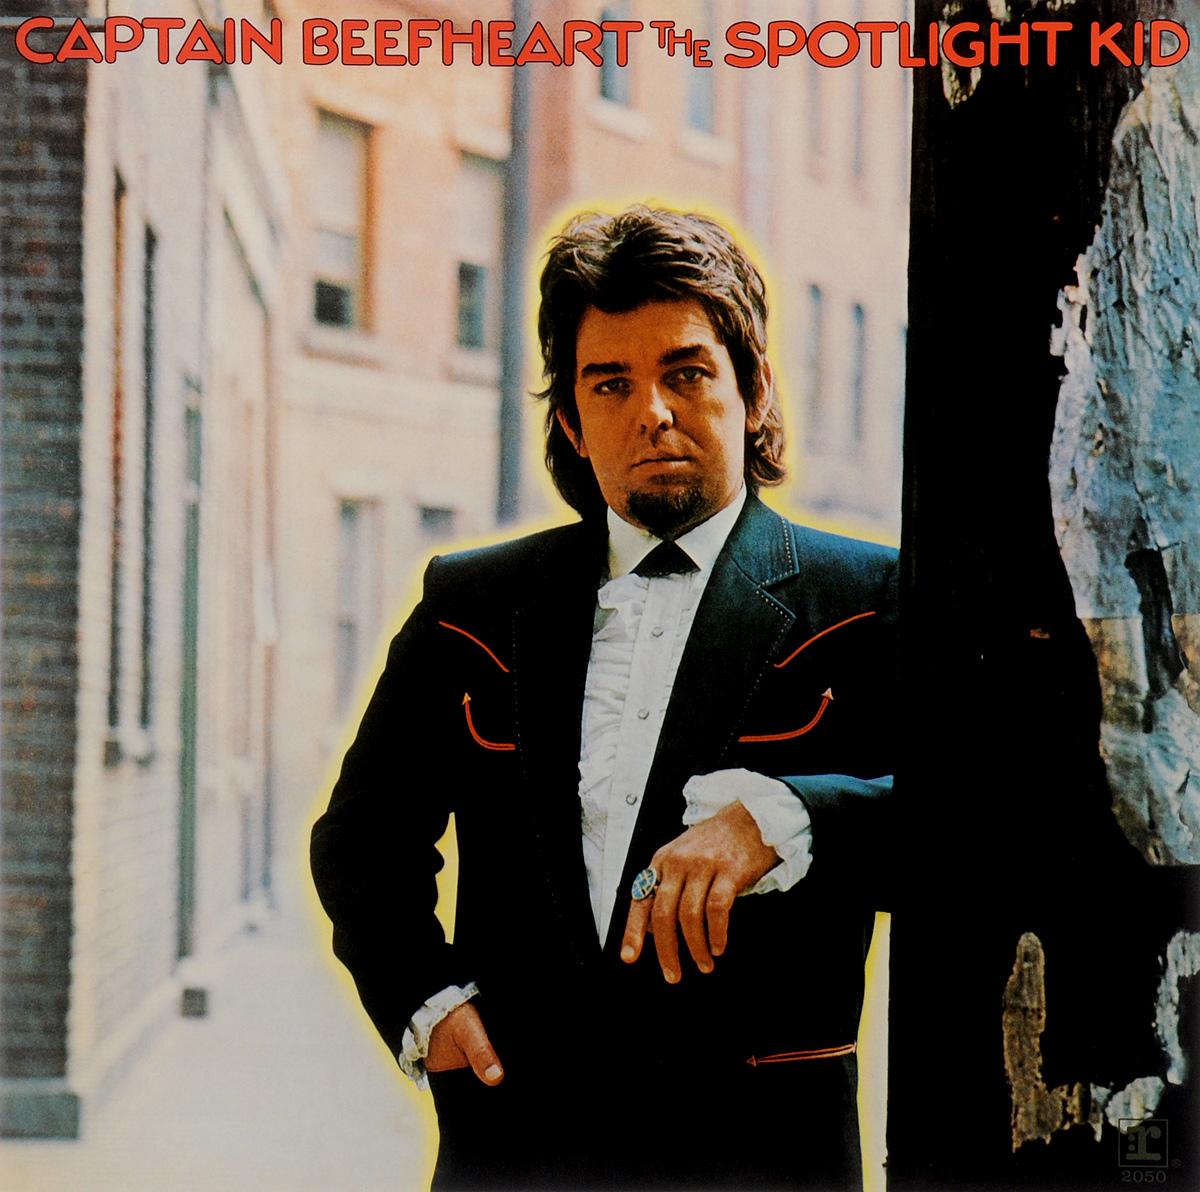 лучшая цена Кэптен Бифхарт Captain Beefheart. The Spotlight Kid (LP)